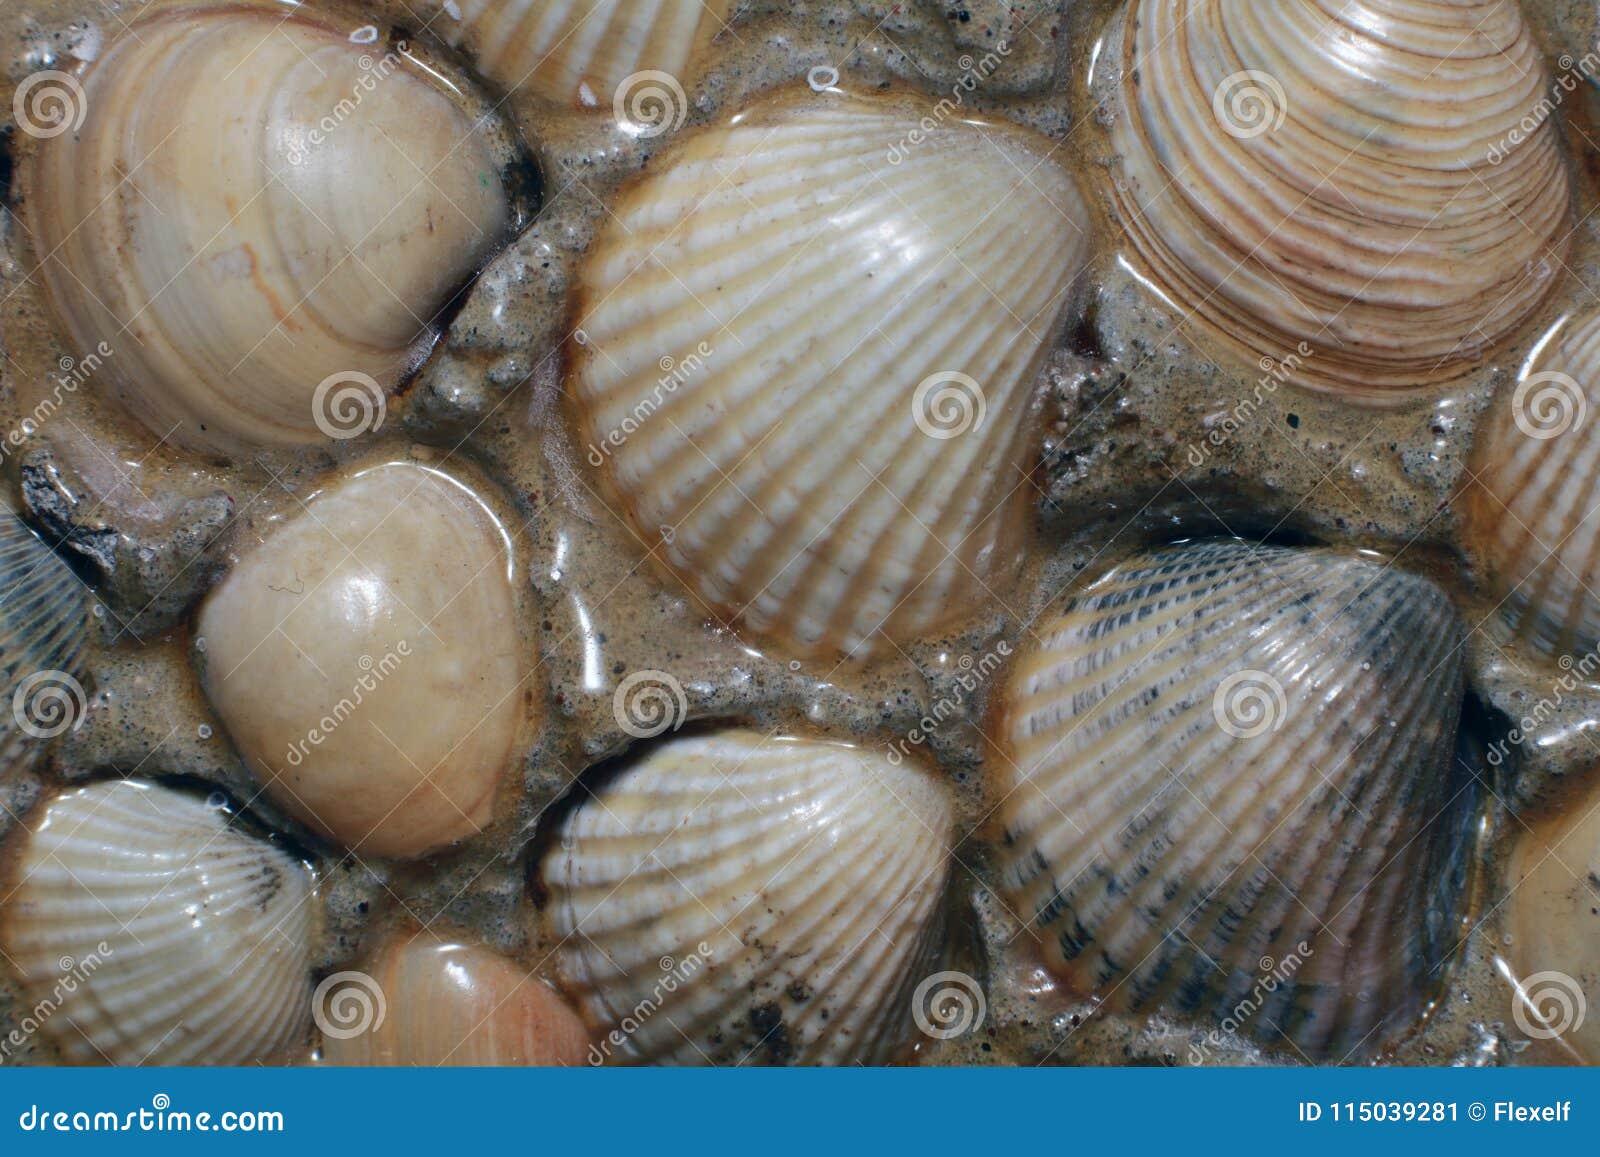 Abstract sea floor background.